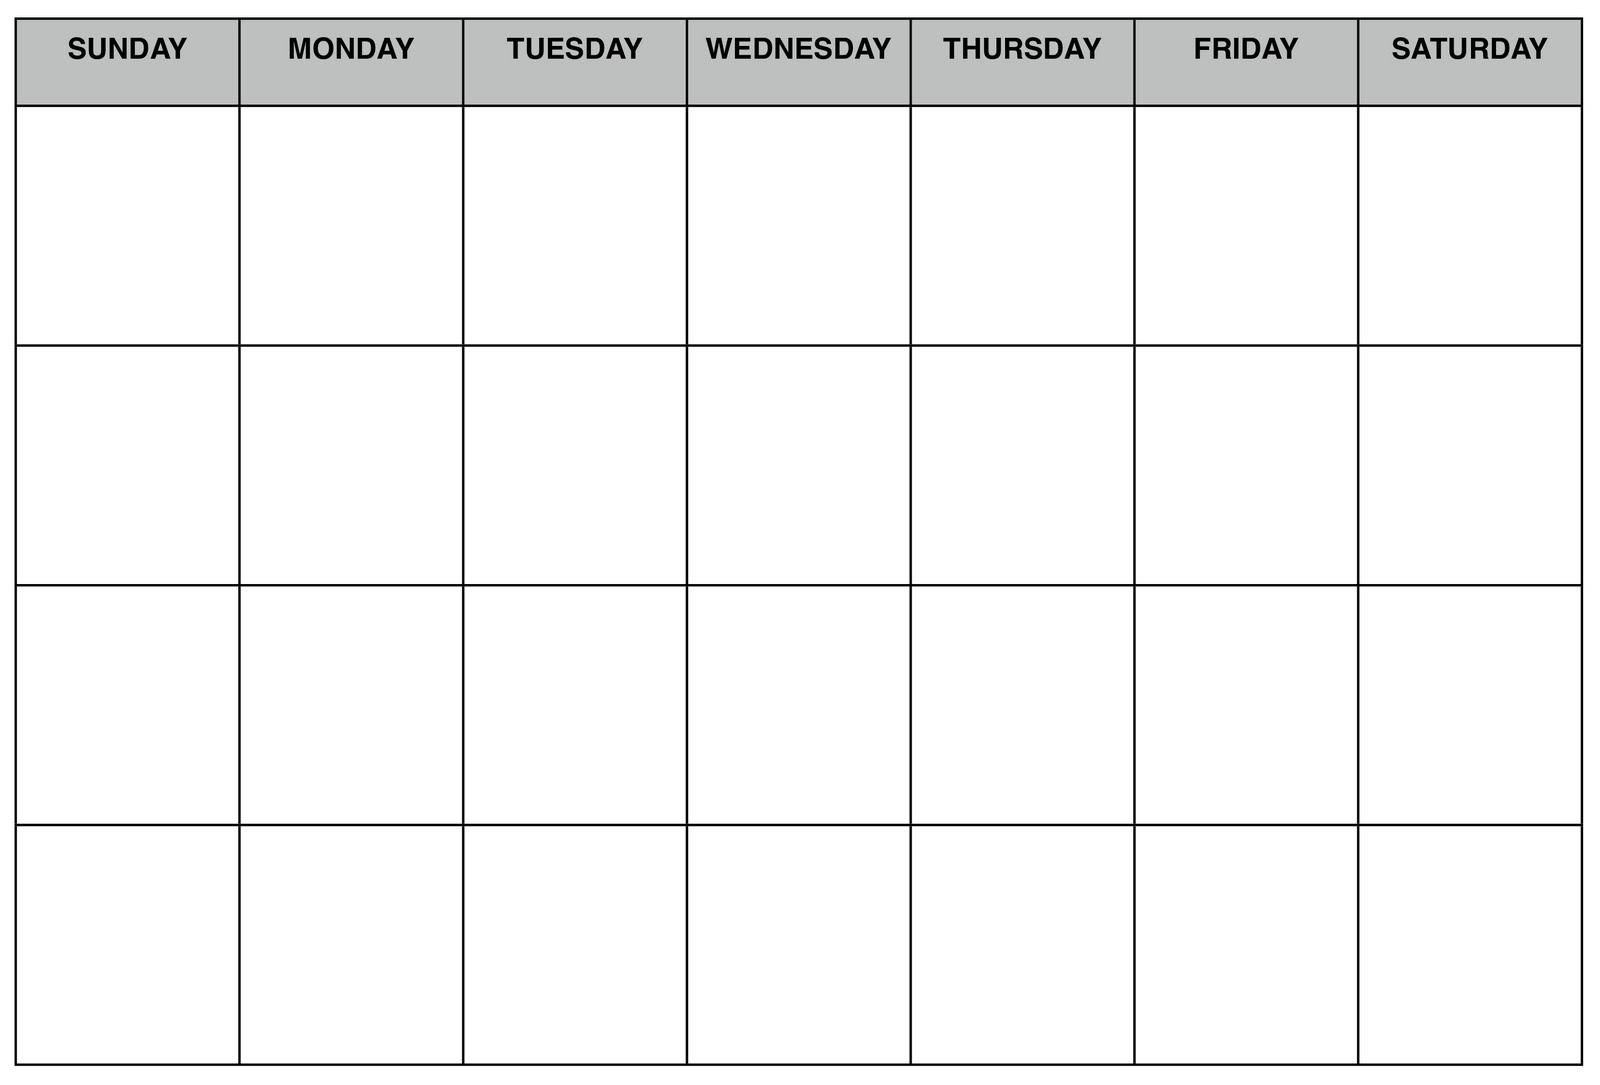 Calendar Itinerary Planner : Travel horizons trusted advisor